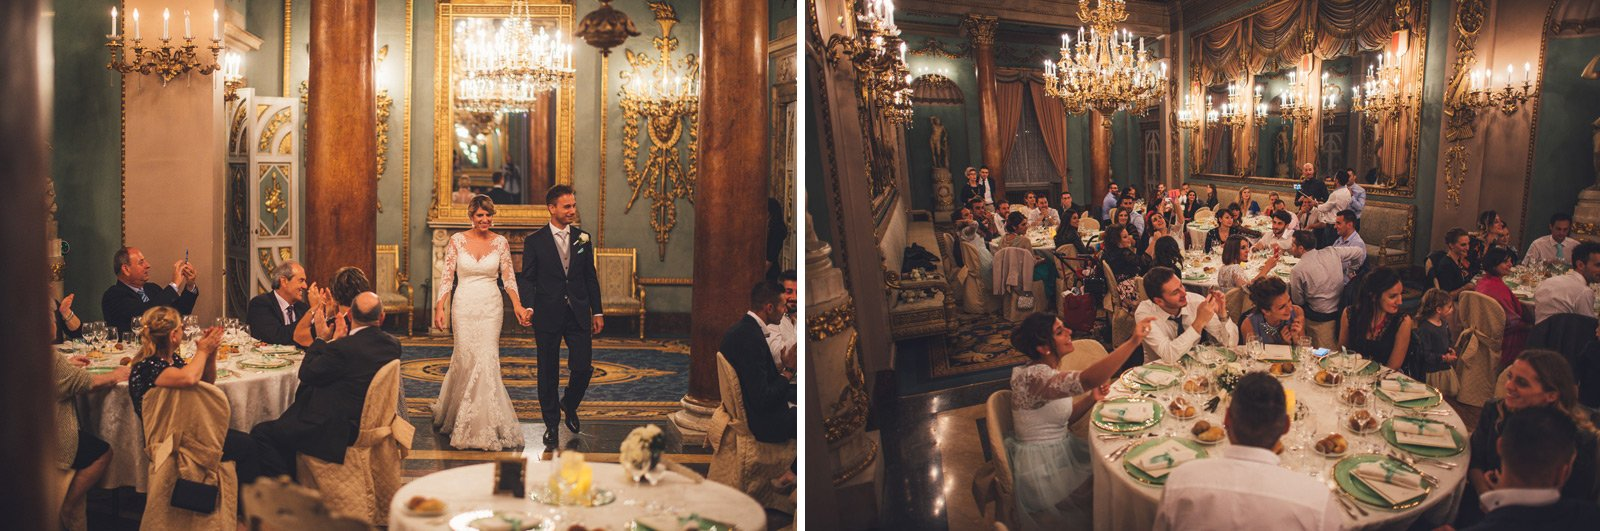 099-wedding-florence-palazzo-borghese